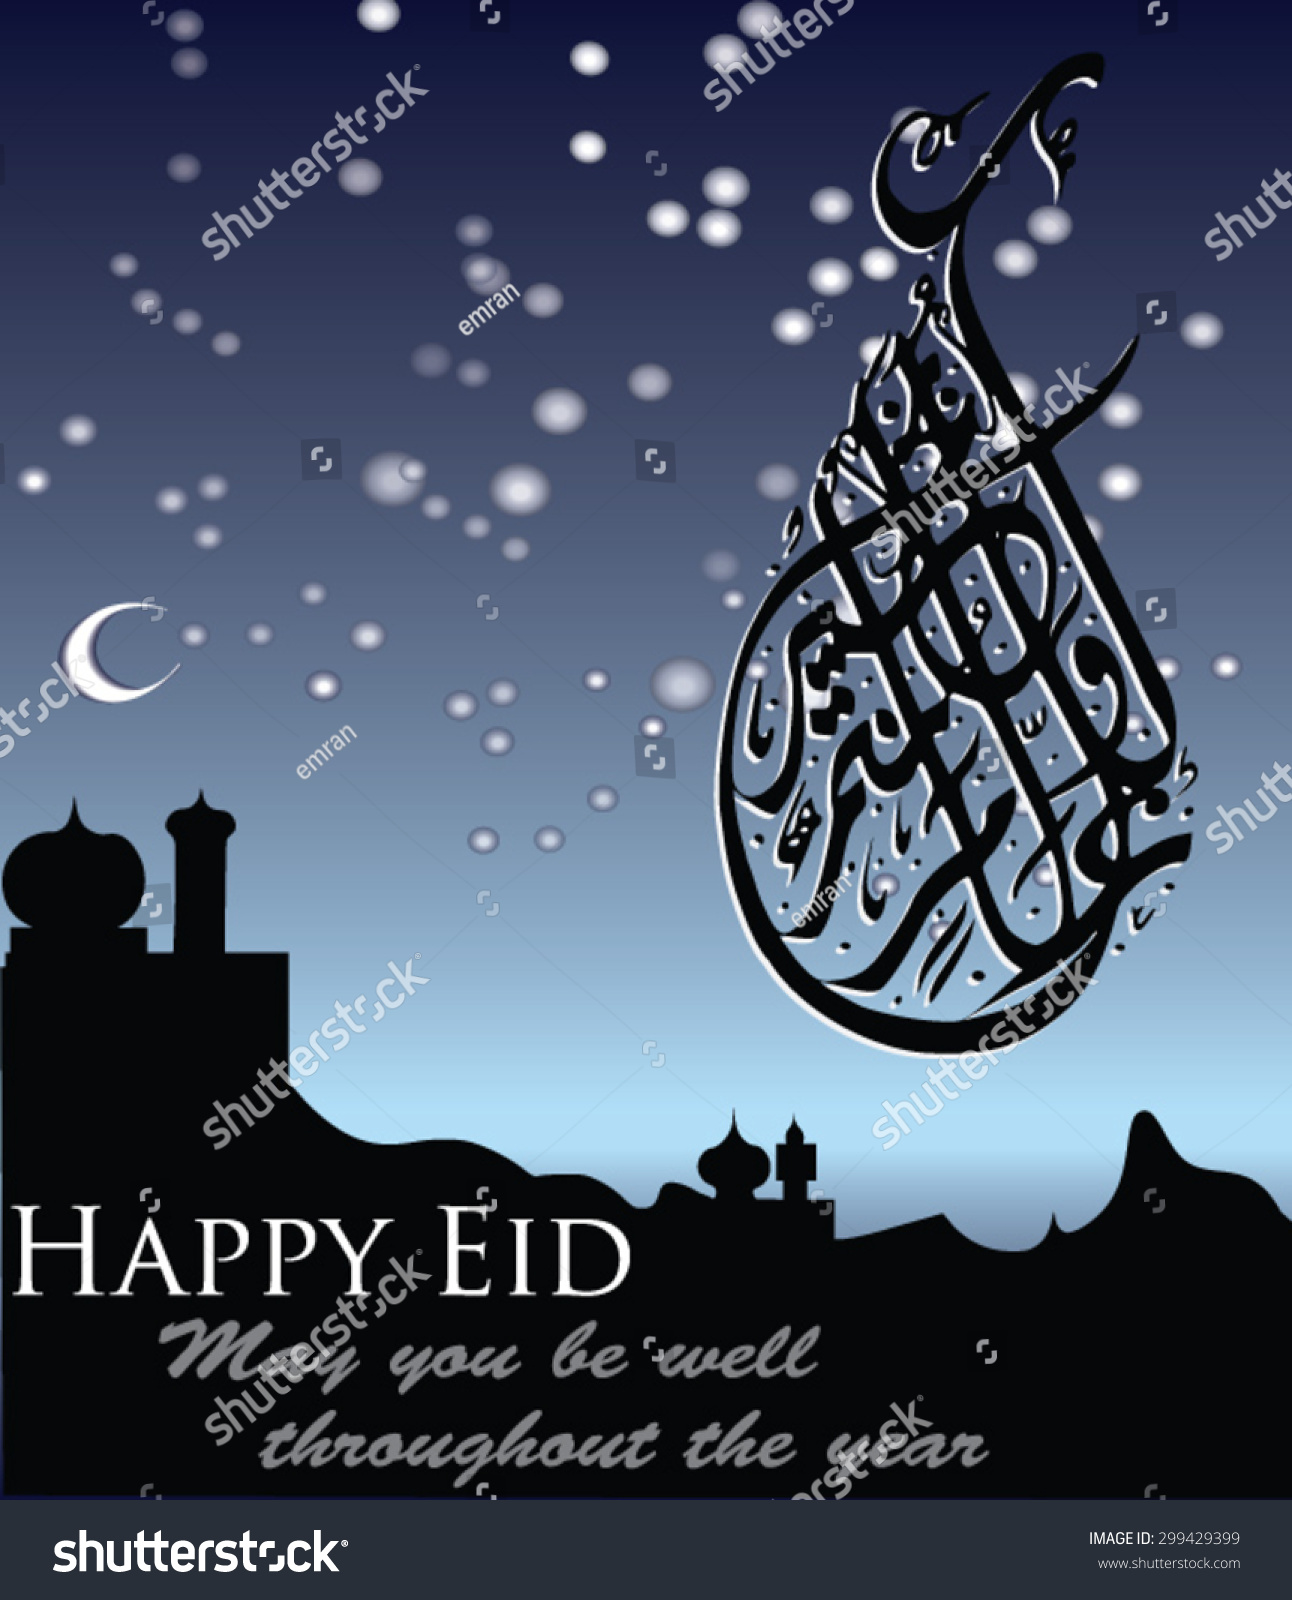 Eid greeting vector diwani jali arabic stock vector 299429399 eid greeting vector in diwani jali arabic calligraphy style translationmay you be well kristyandbryce Choice Image